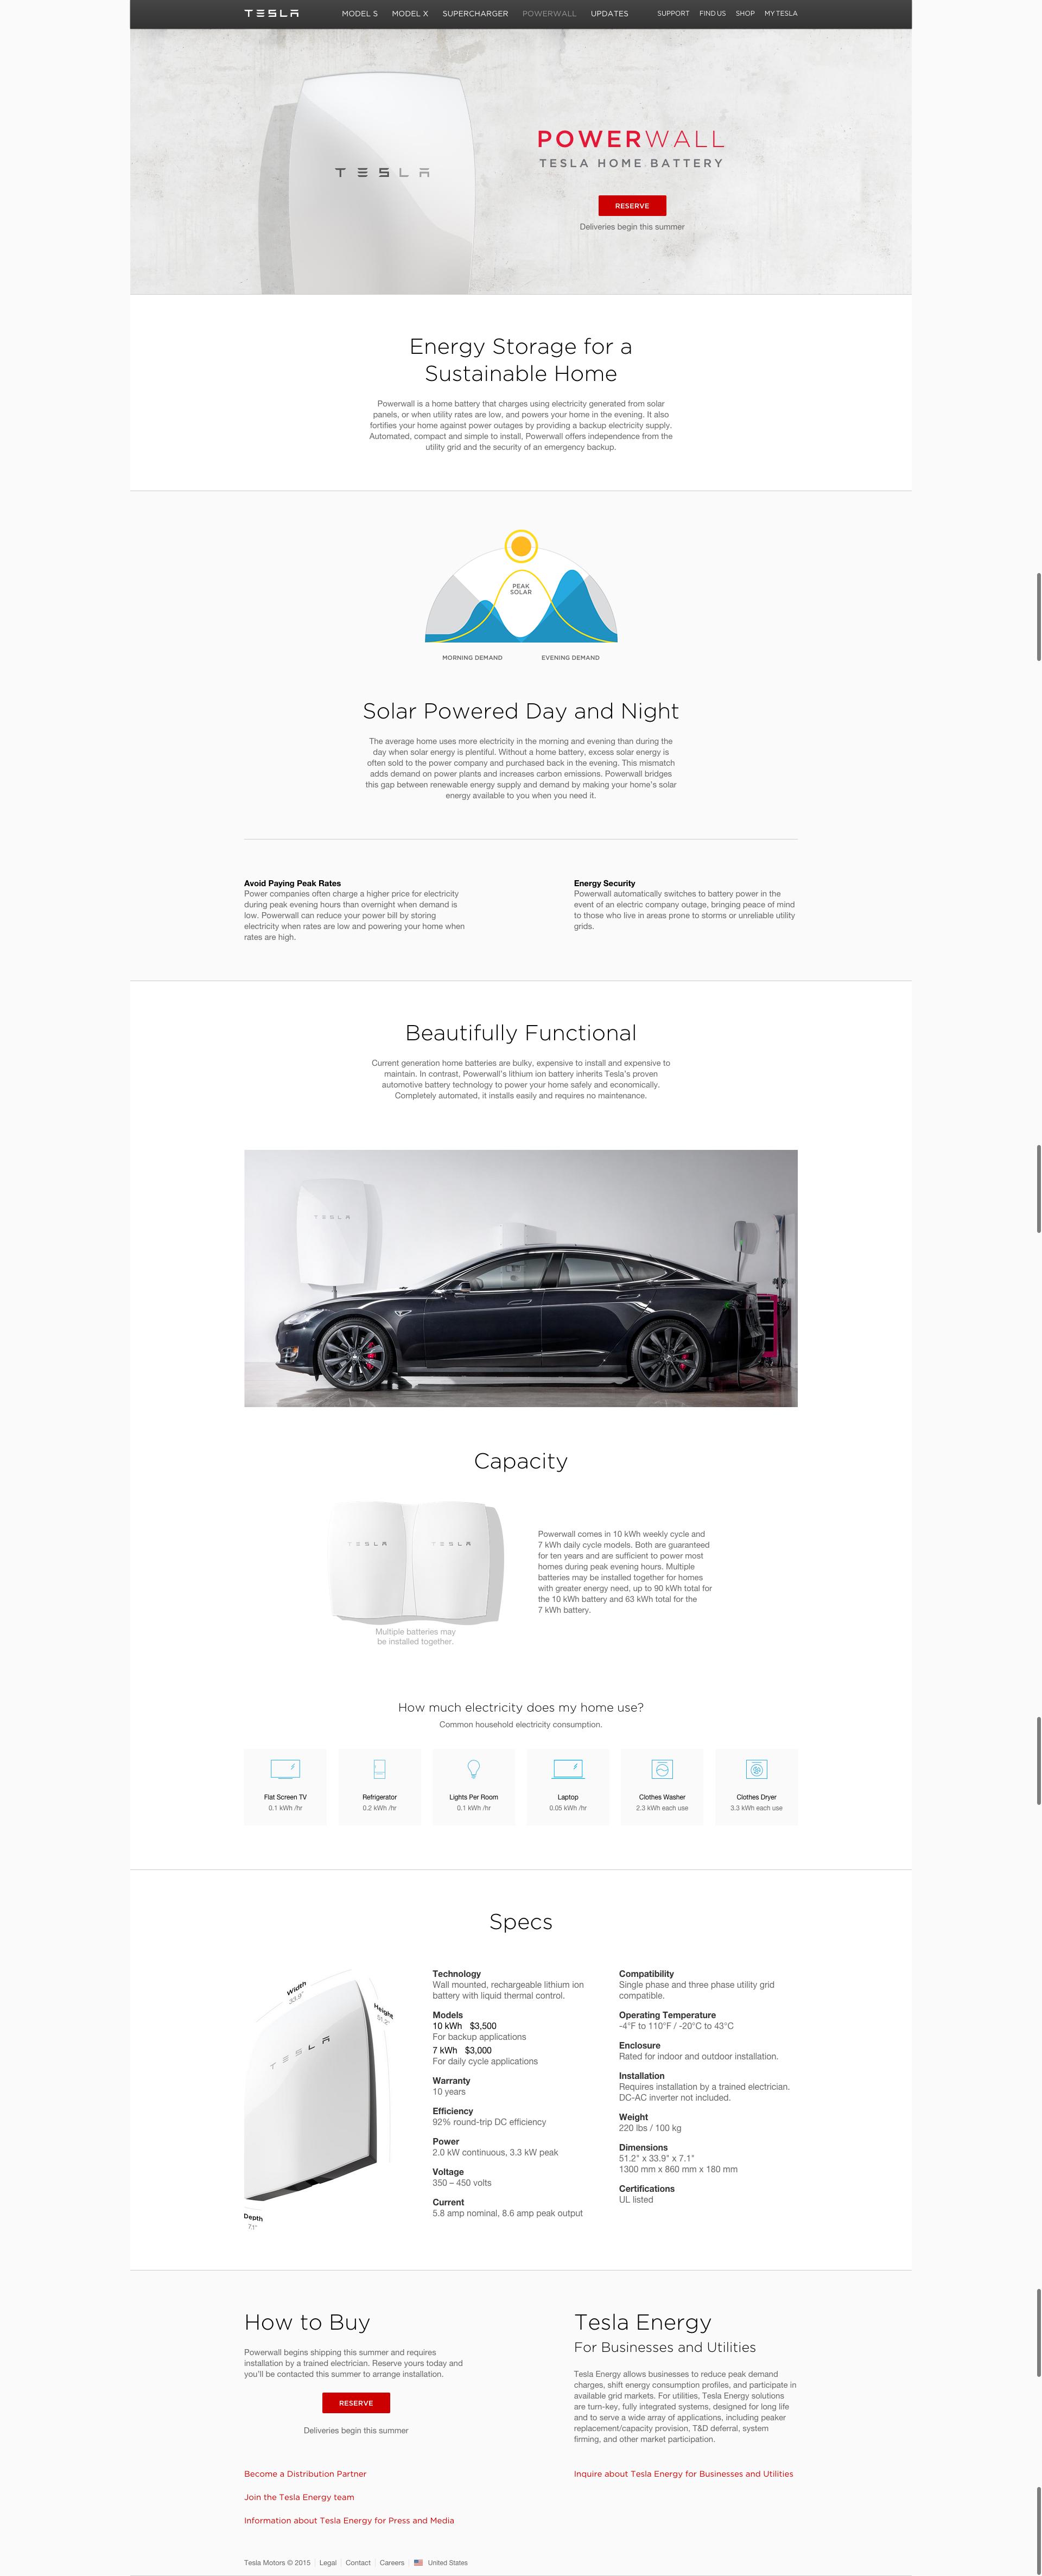 tesla-powerwall-sales-page